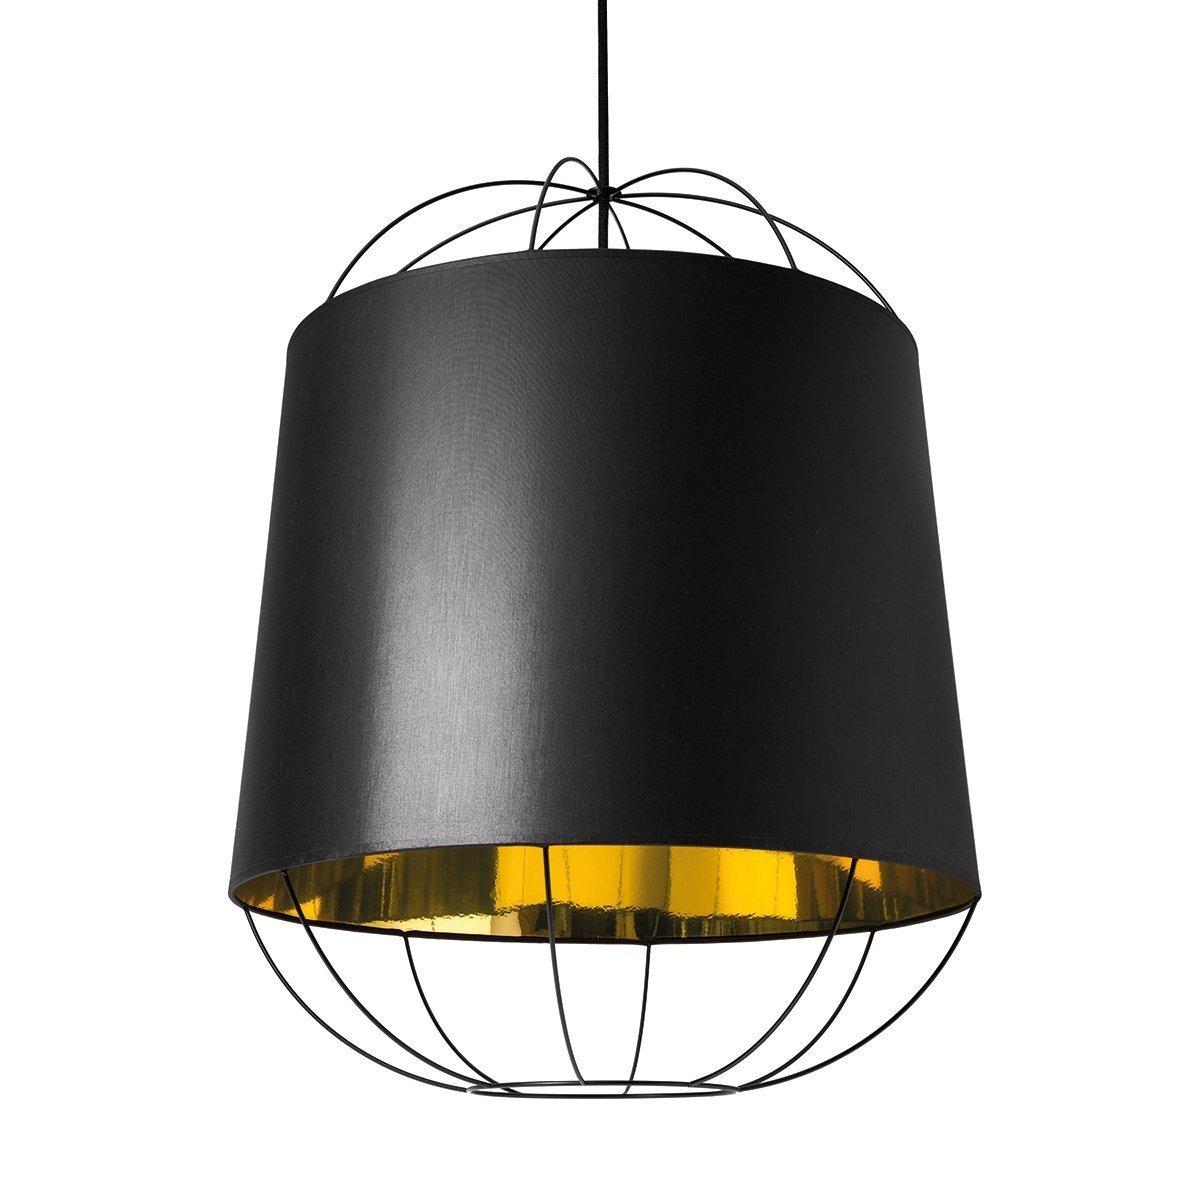 Petite Friture Lanterna M Zwart